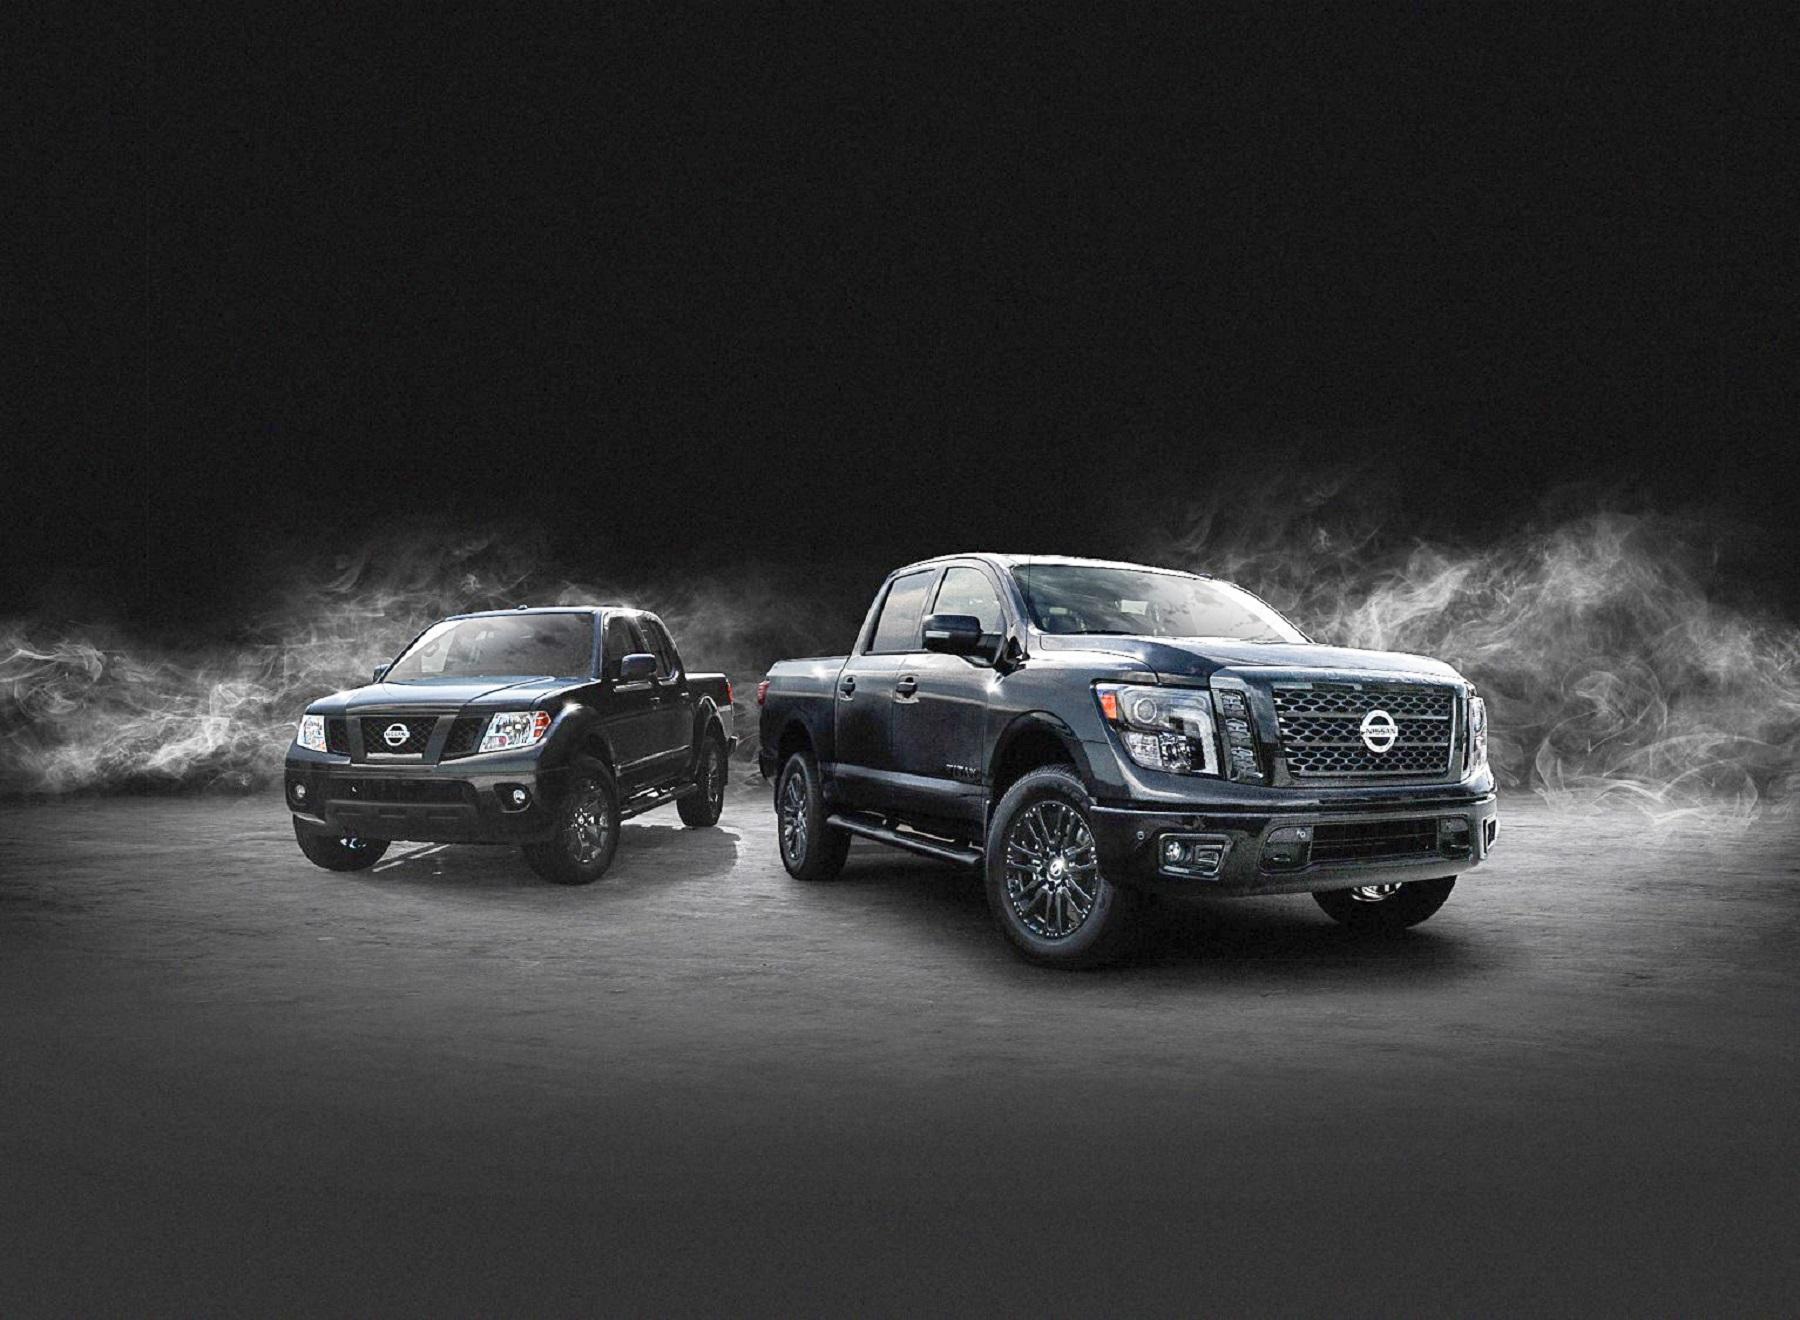 Dress Up with the Pickup: Nissan Titan Custom Looks - Truck